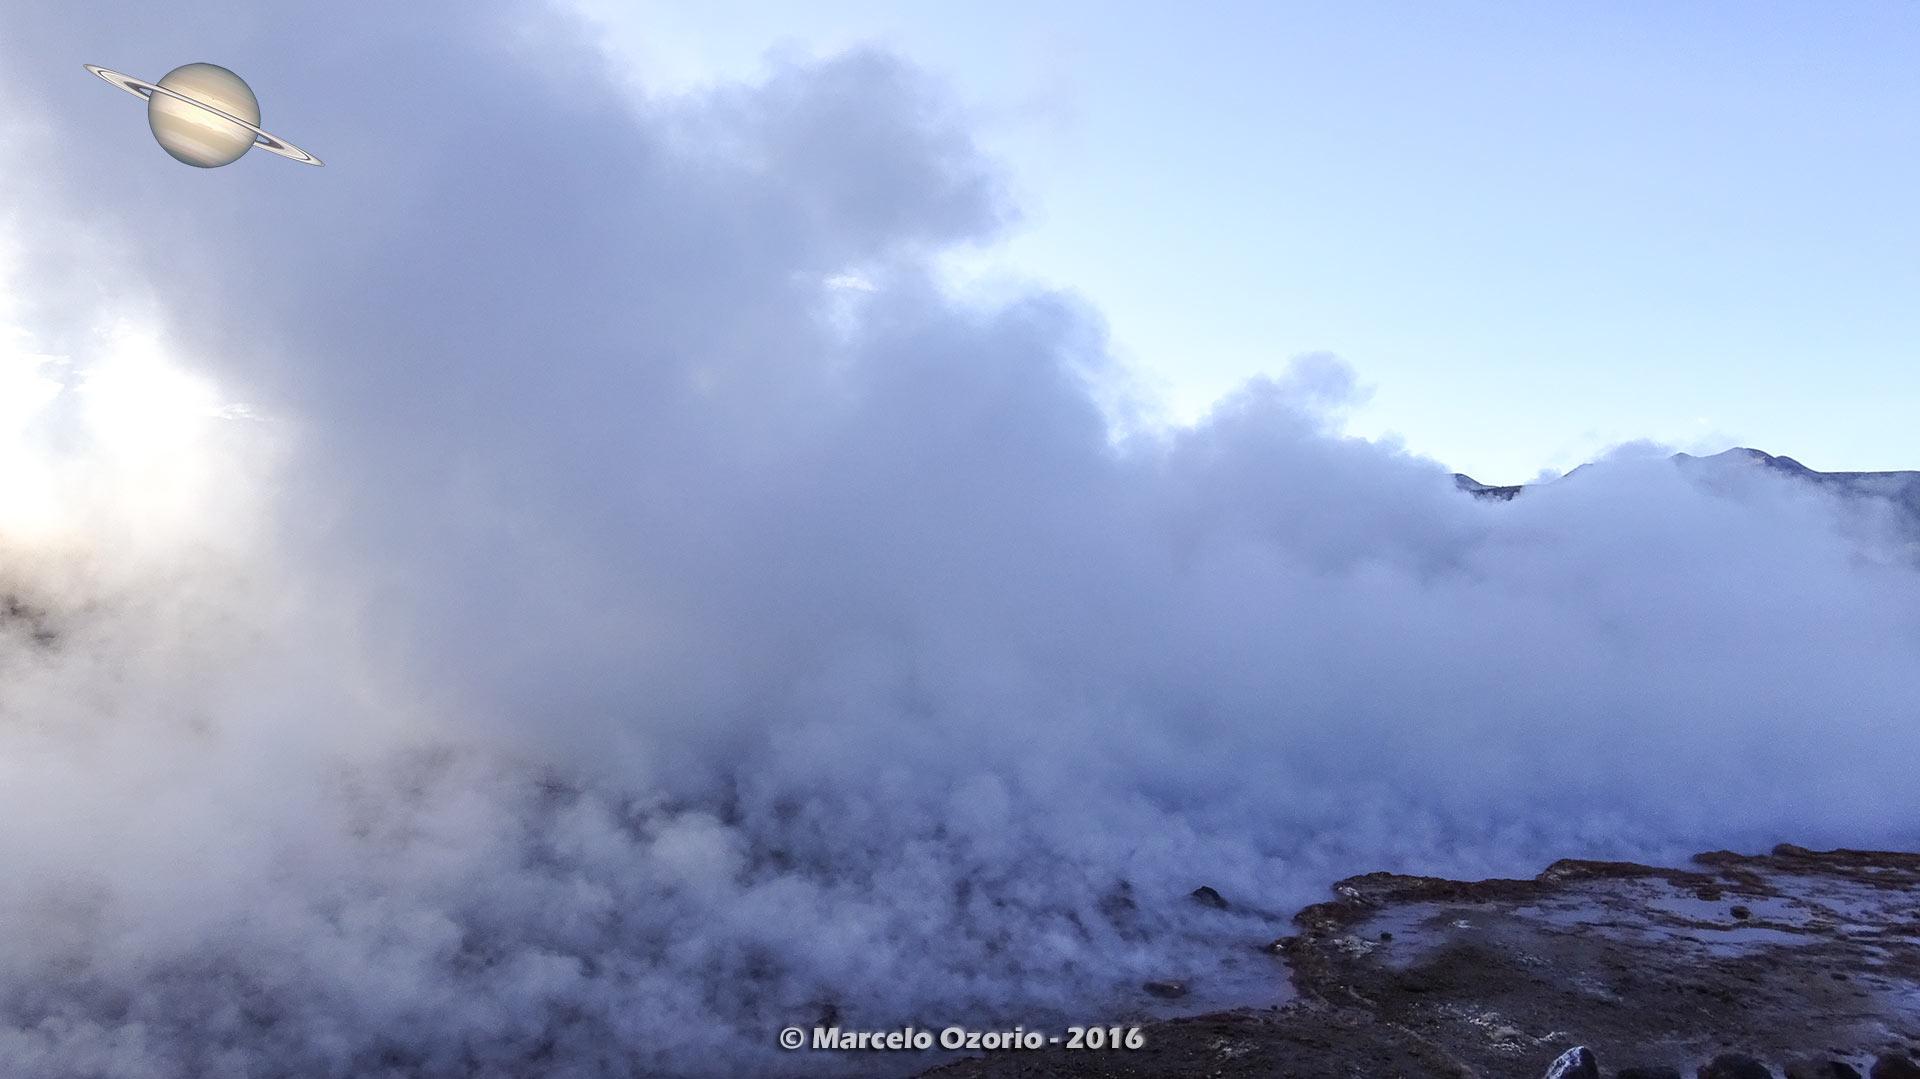 el tatio geysers atacama desert 9 - Os Surreais Gêiseres El Tatio - Deserto do Atacama - Chile